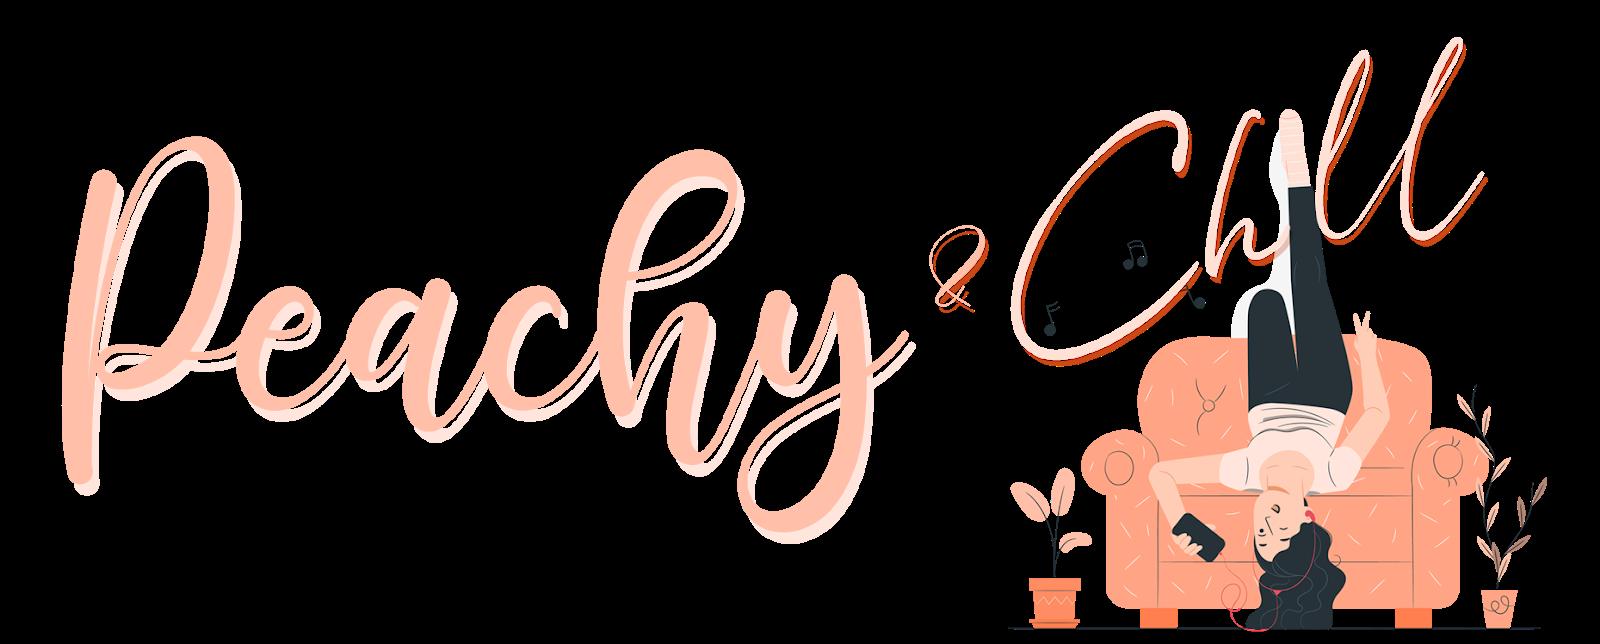 Peachy & Chill